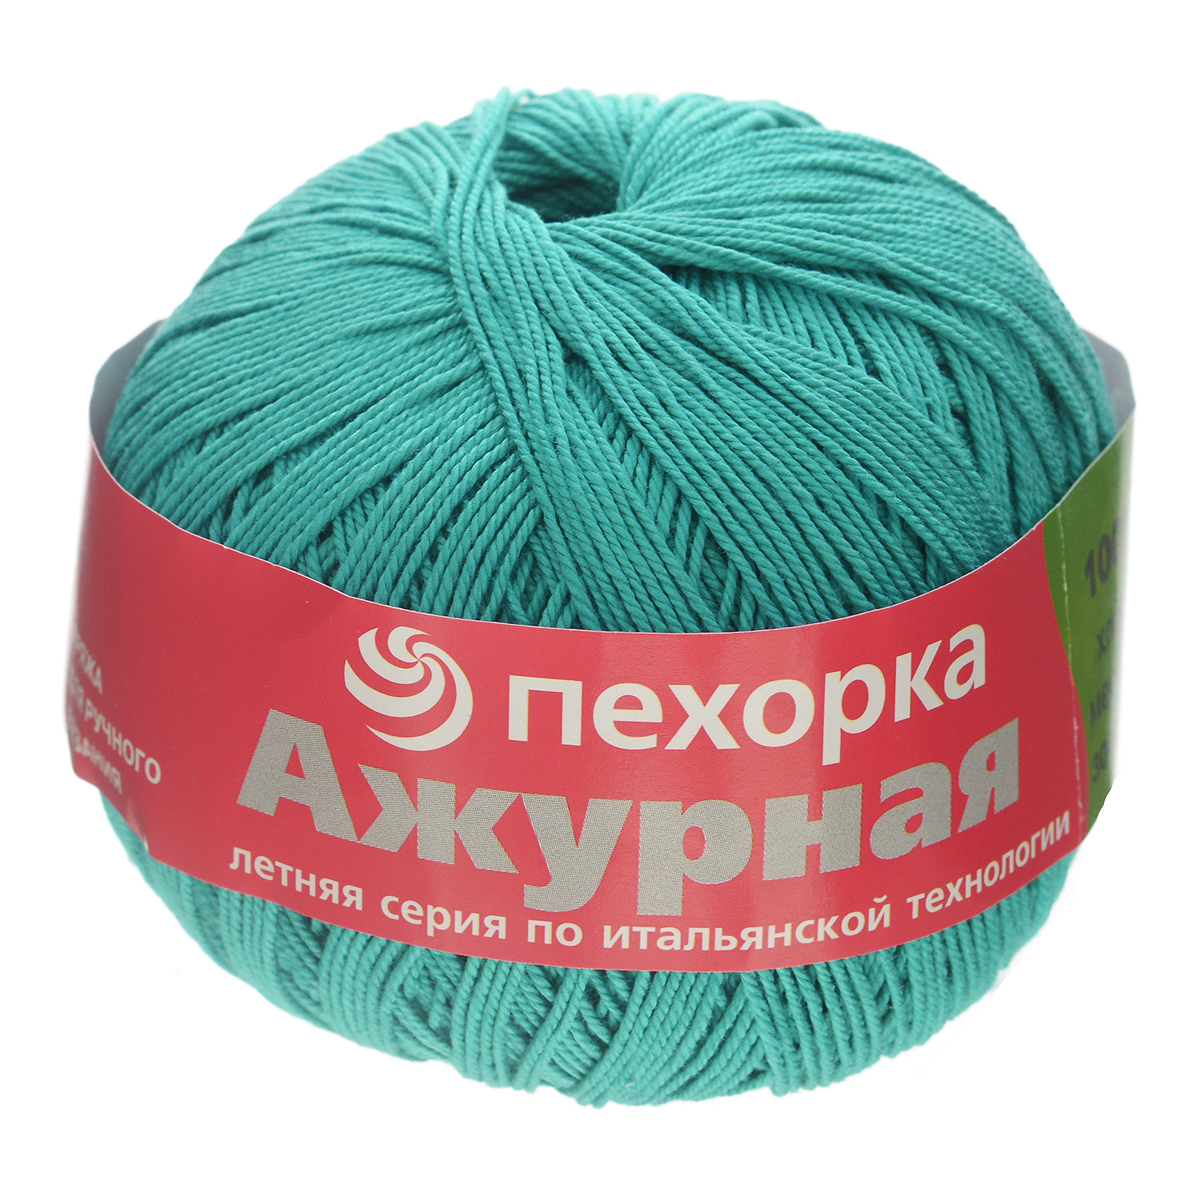 Пряжа для вязания Пехорка Ажурная, цвет: зеленка (511), 280 м, 50 г, 10 шт автохимия зеленка